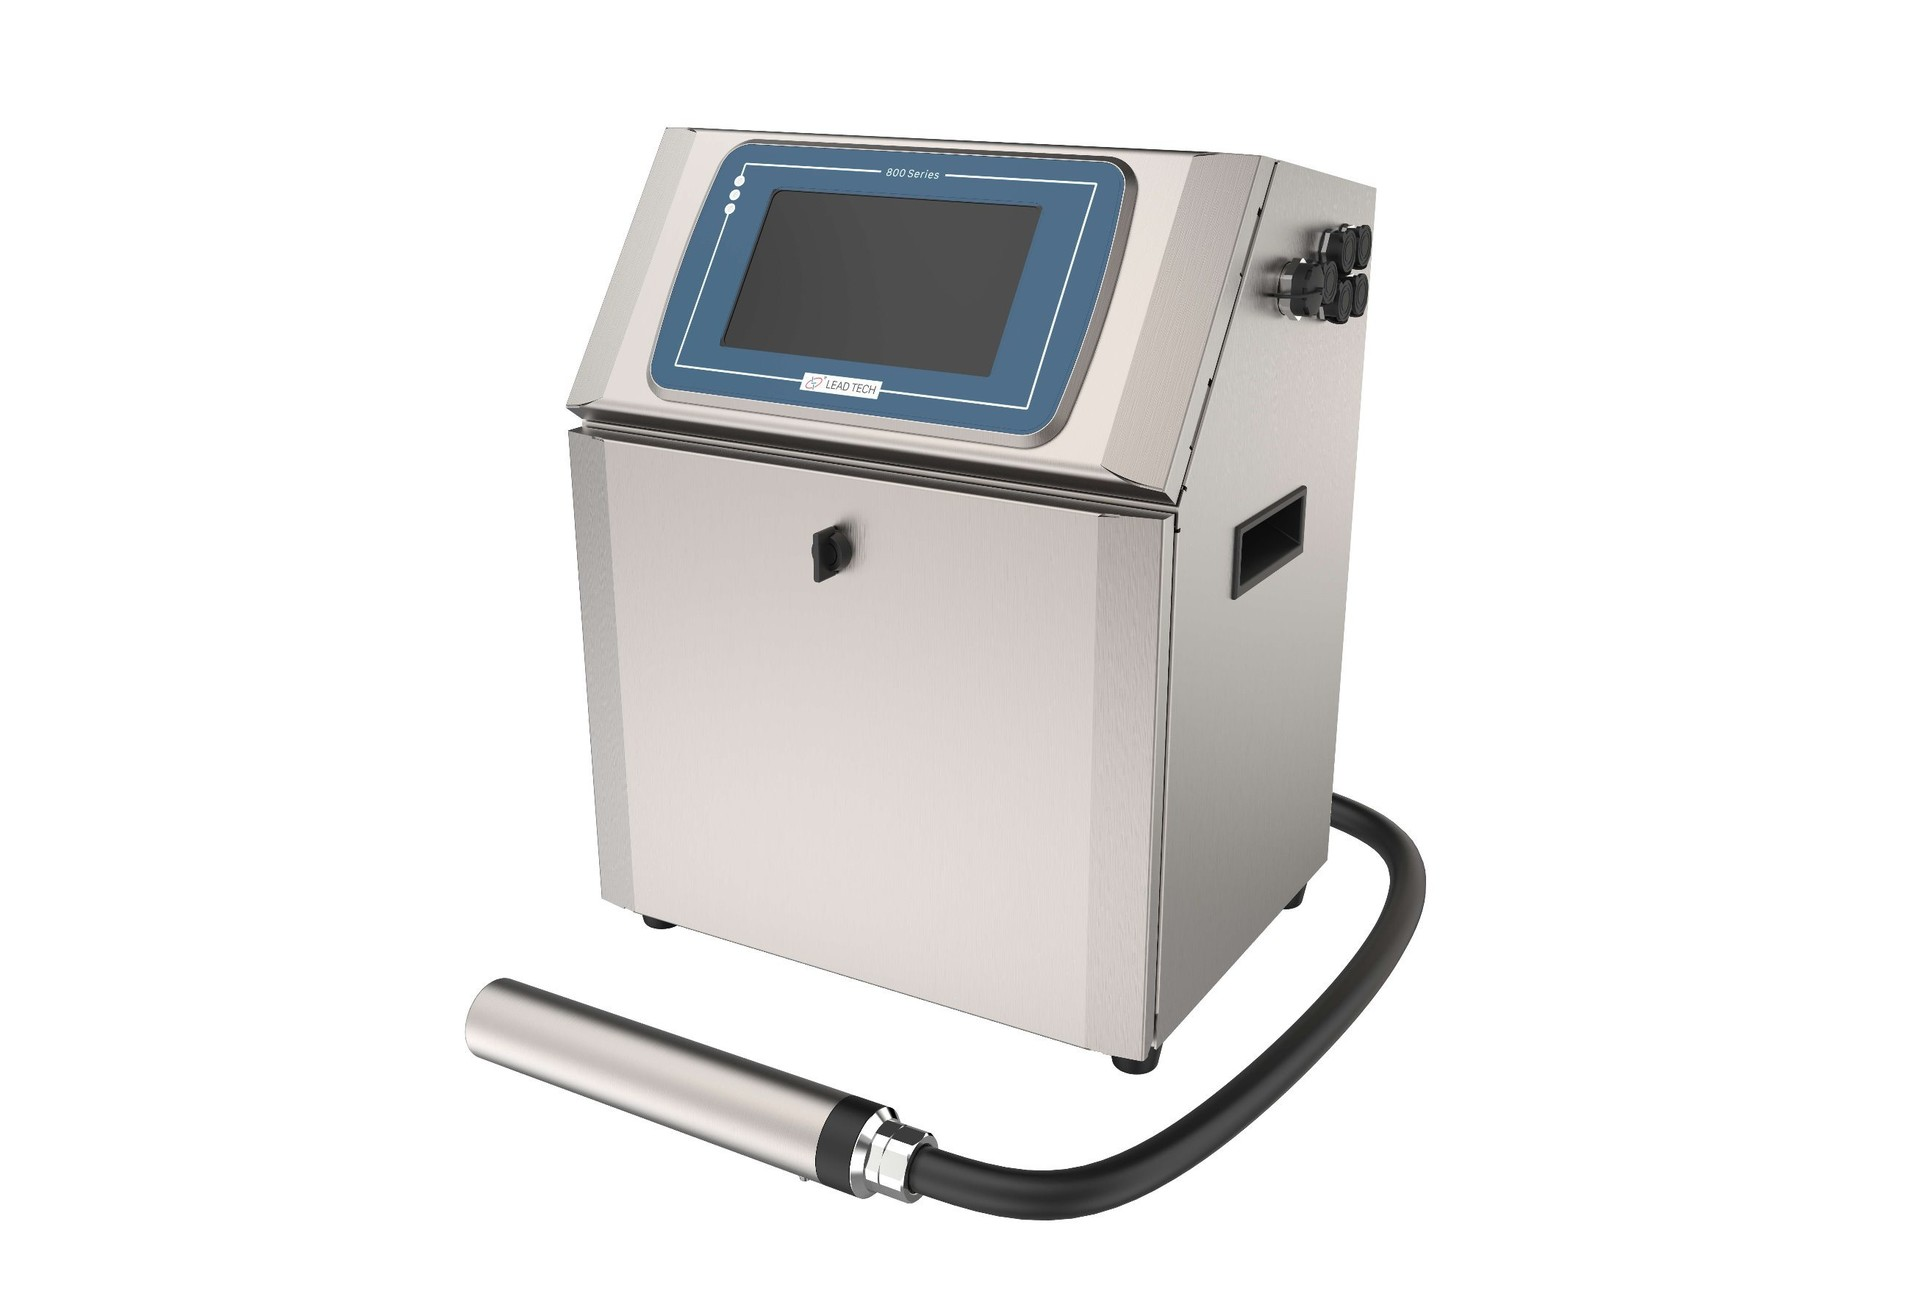 Lt800 Dole Can Coding Cij Inkjet Printer